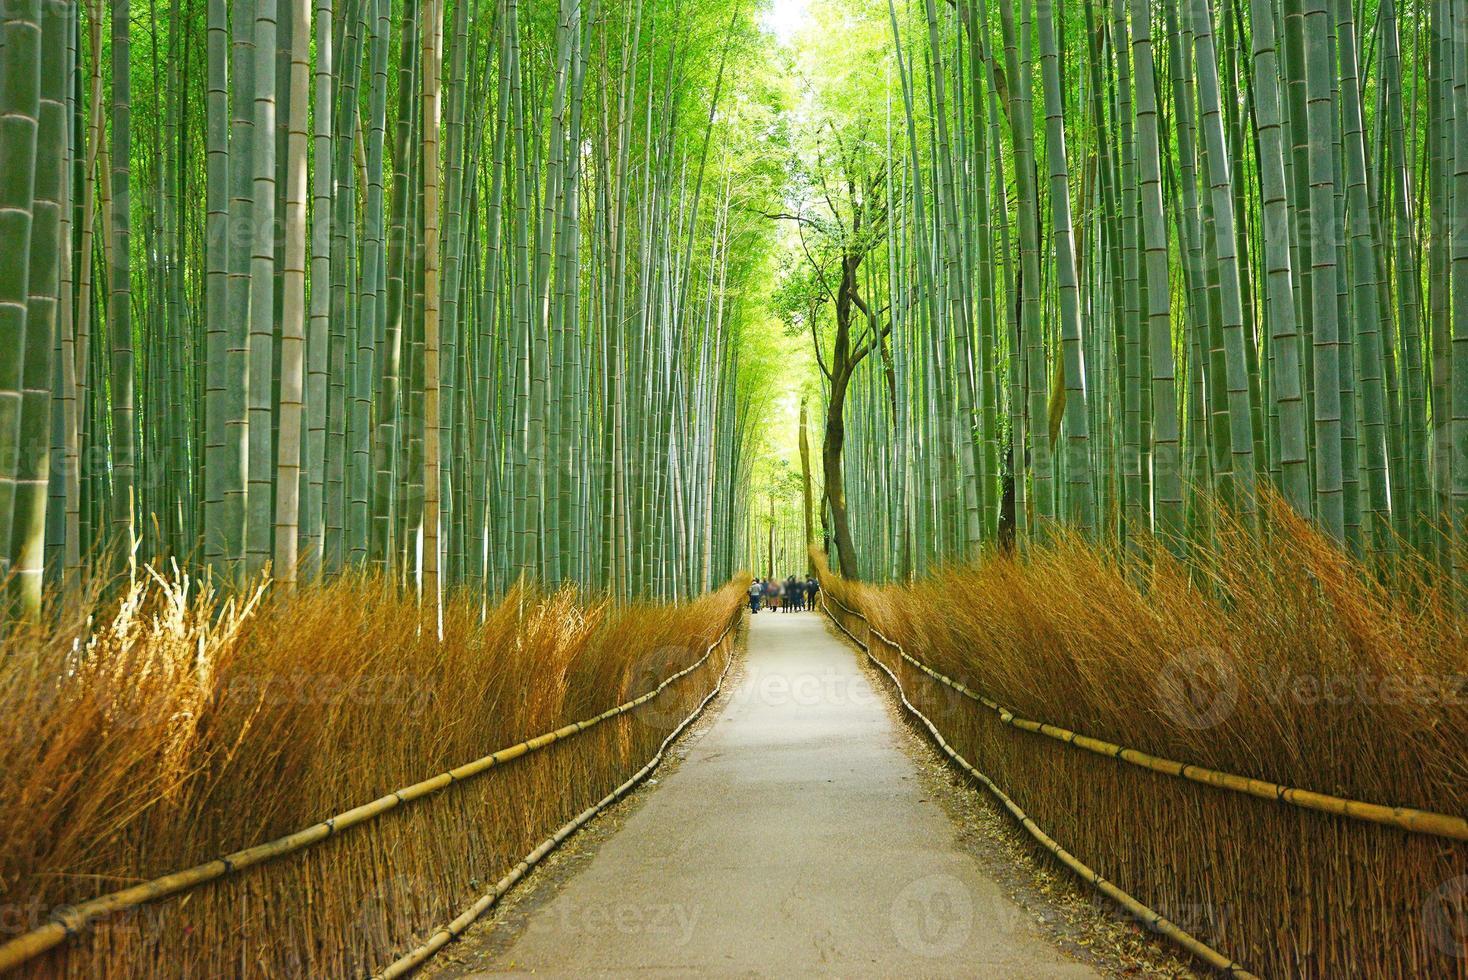 bamboo groove photo